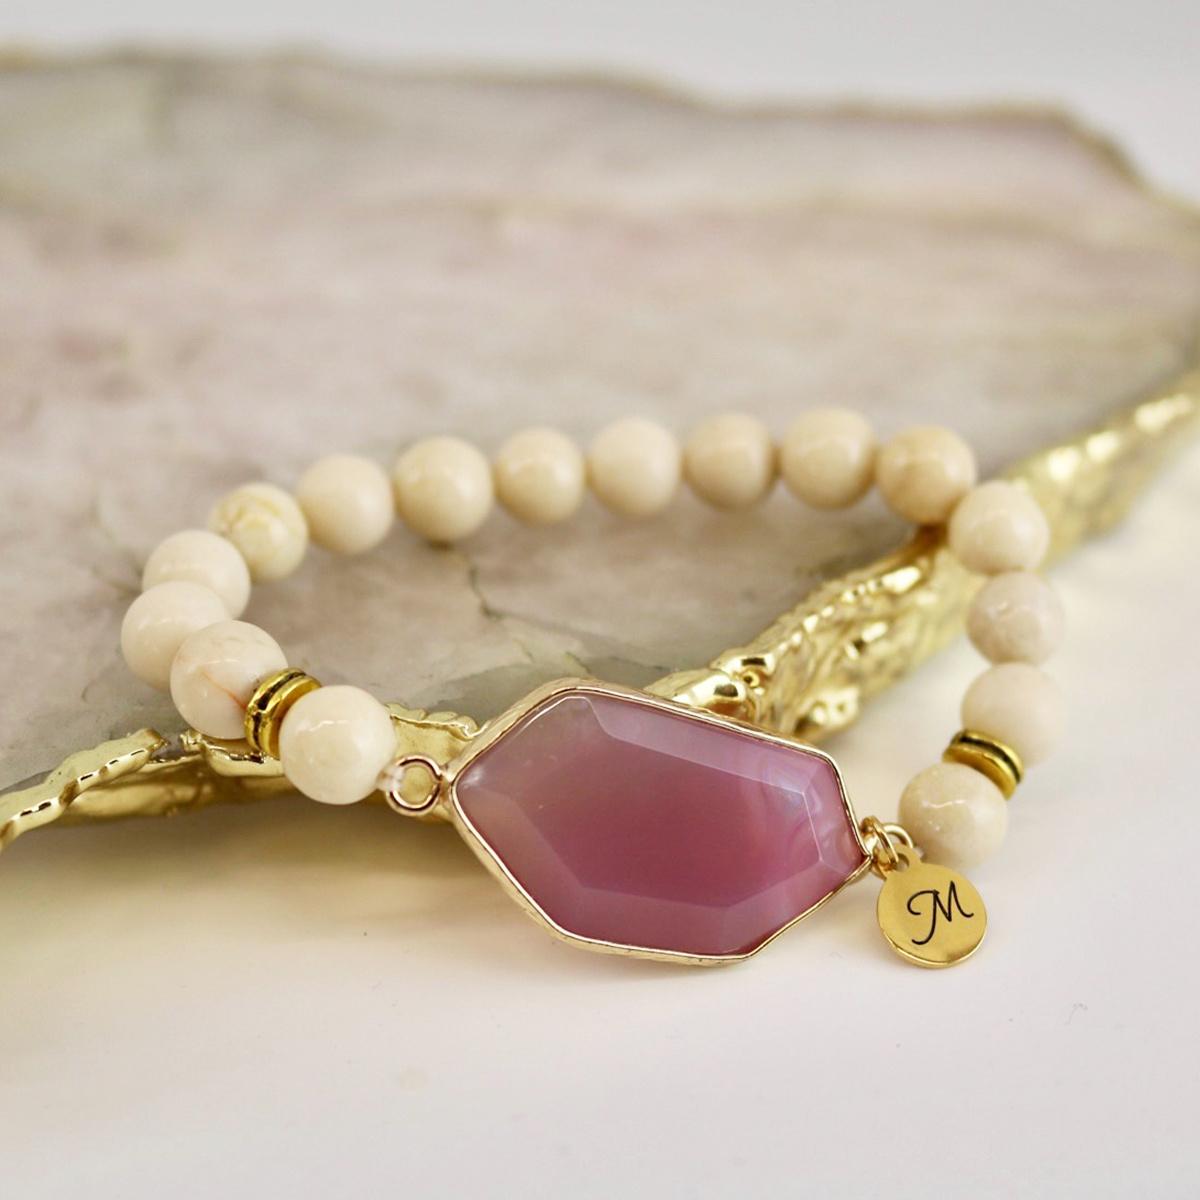 Royal Bracelet - Ivory Stone with Magenta Gem-2